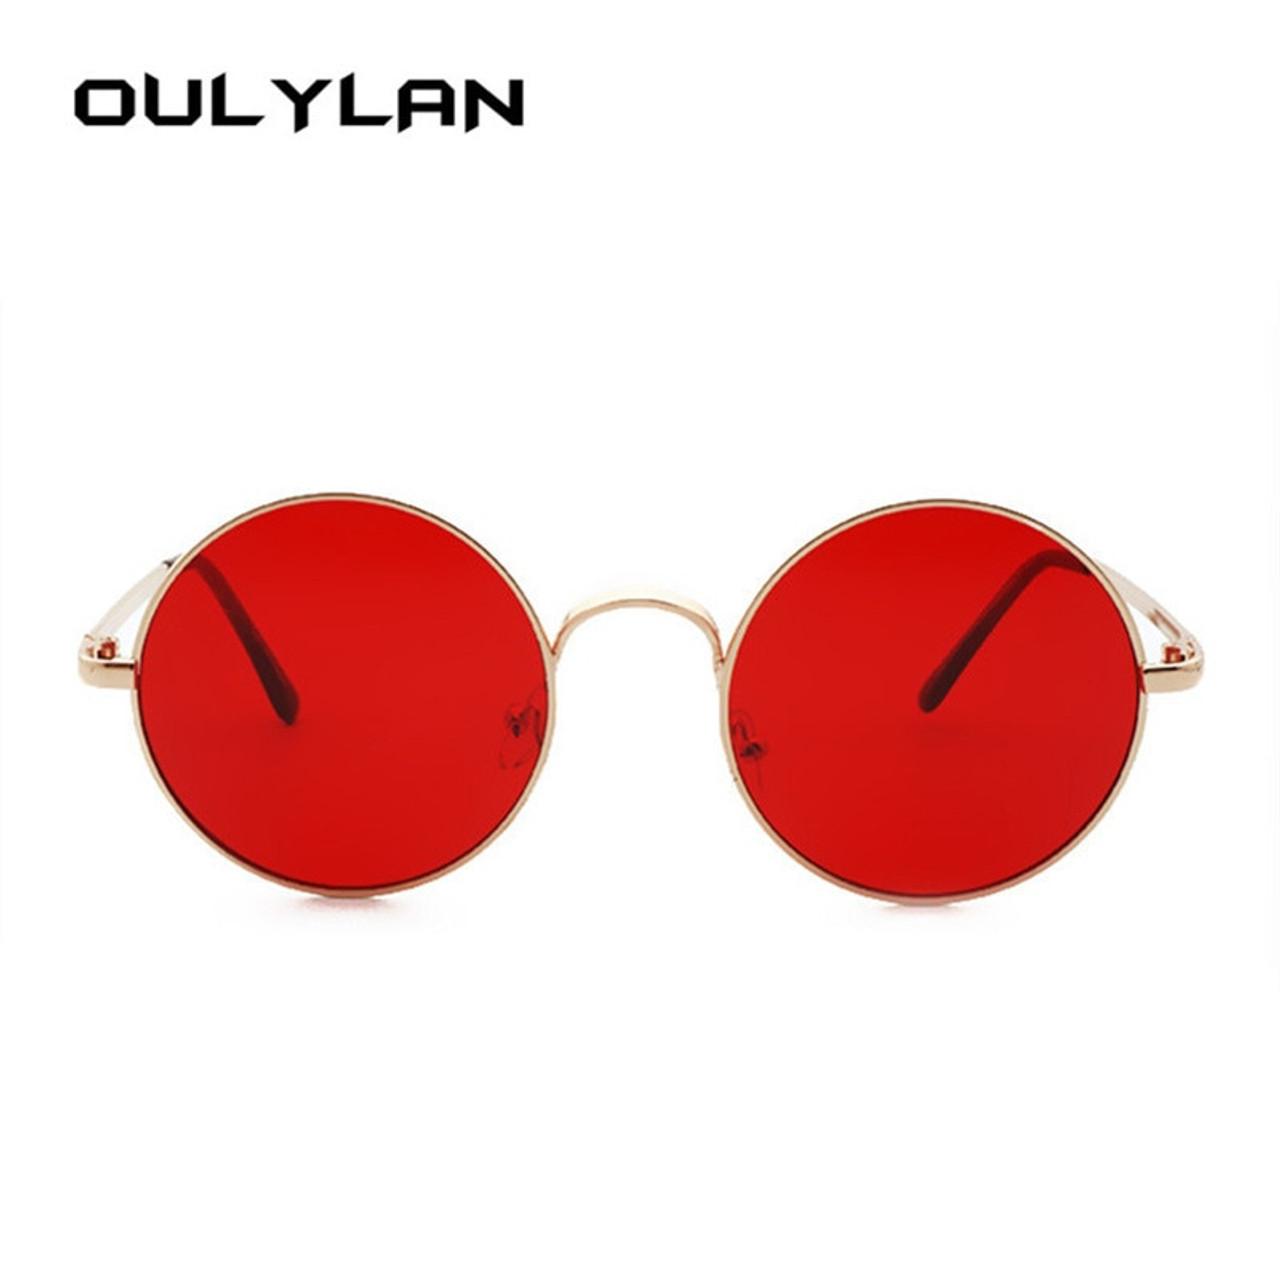 a71a97cb586f4 ... Oulylan Retro Round Sunglasses Men Women Brand Designer Red Sun glasses  Female Vintage Metal Big Sunglasses ...